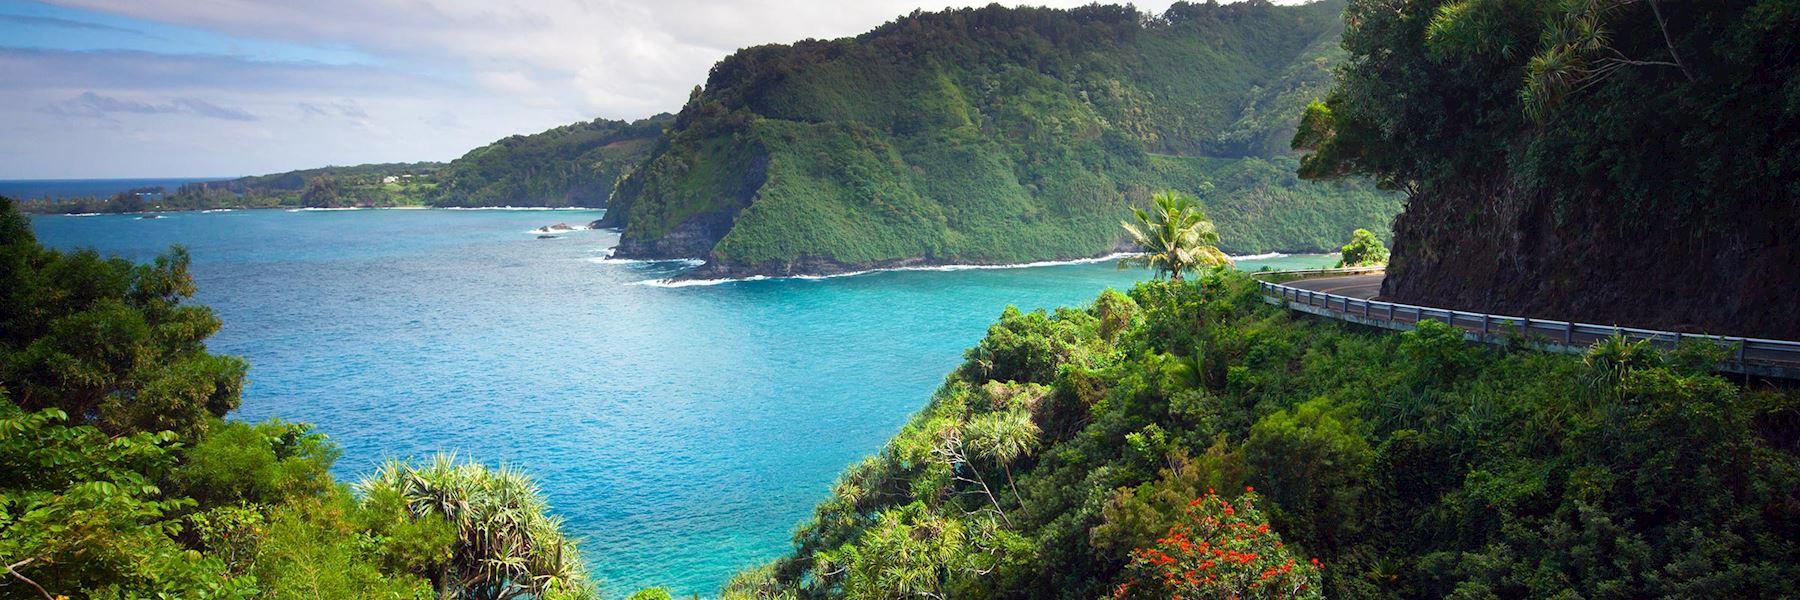 Hawaii travel guides